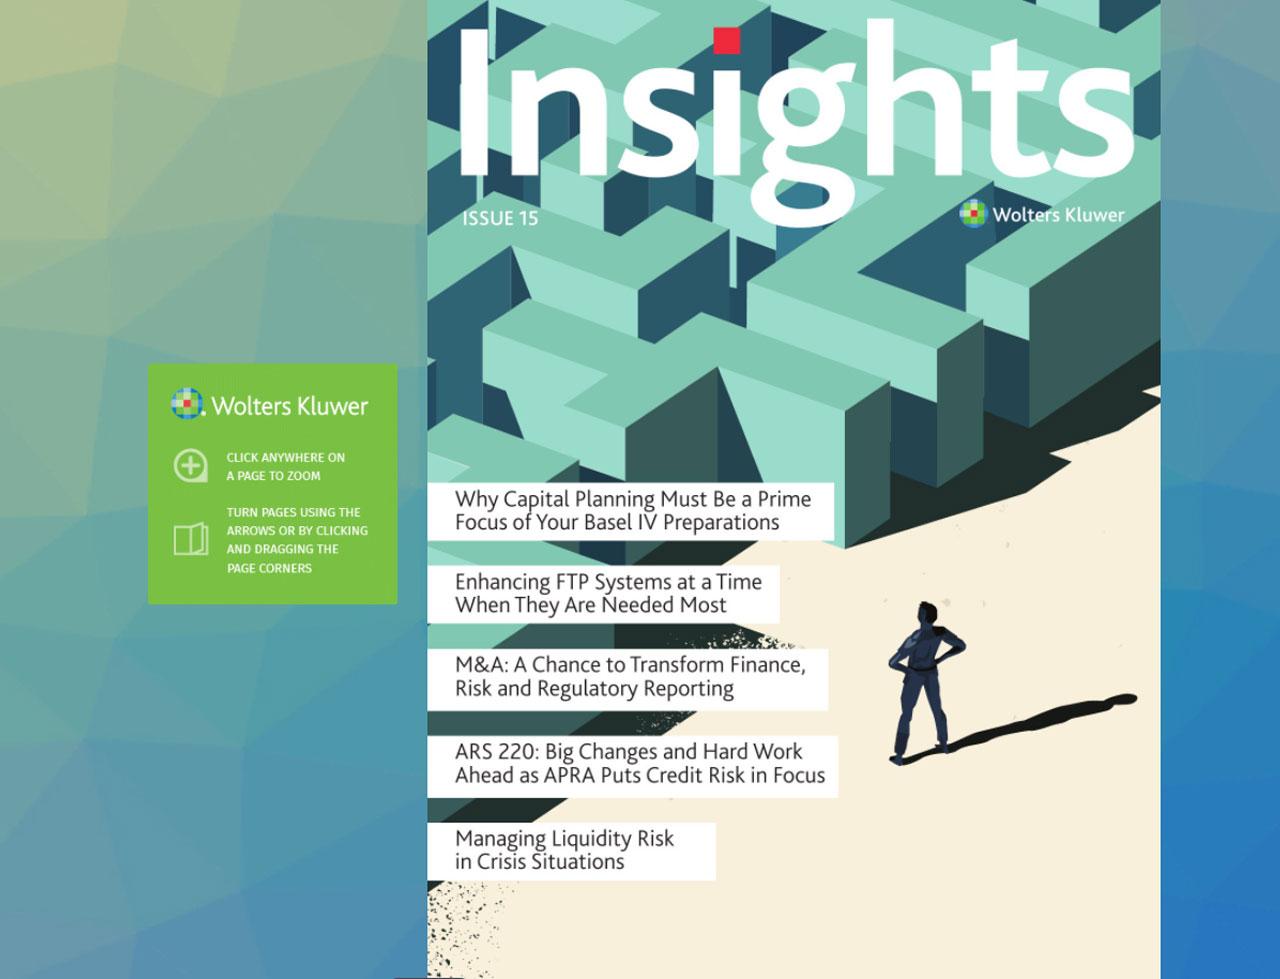 Insights Magazine issue 15